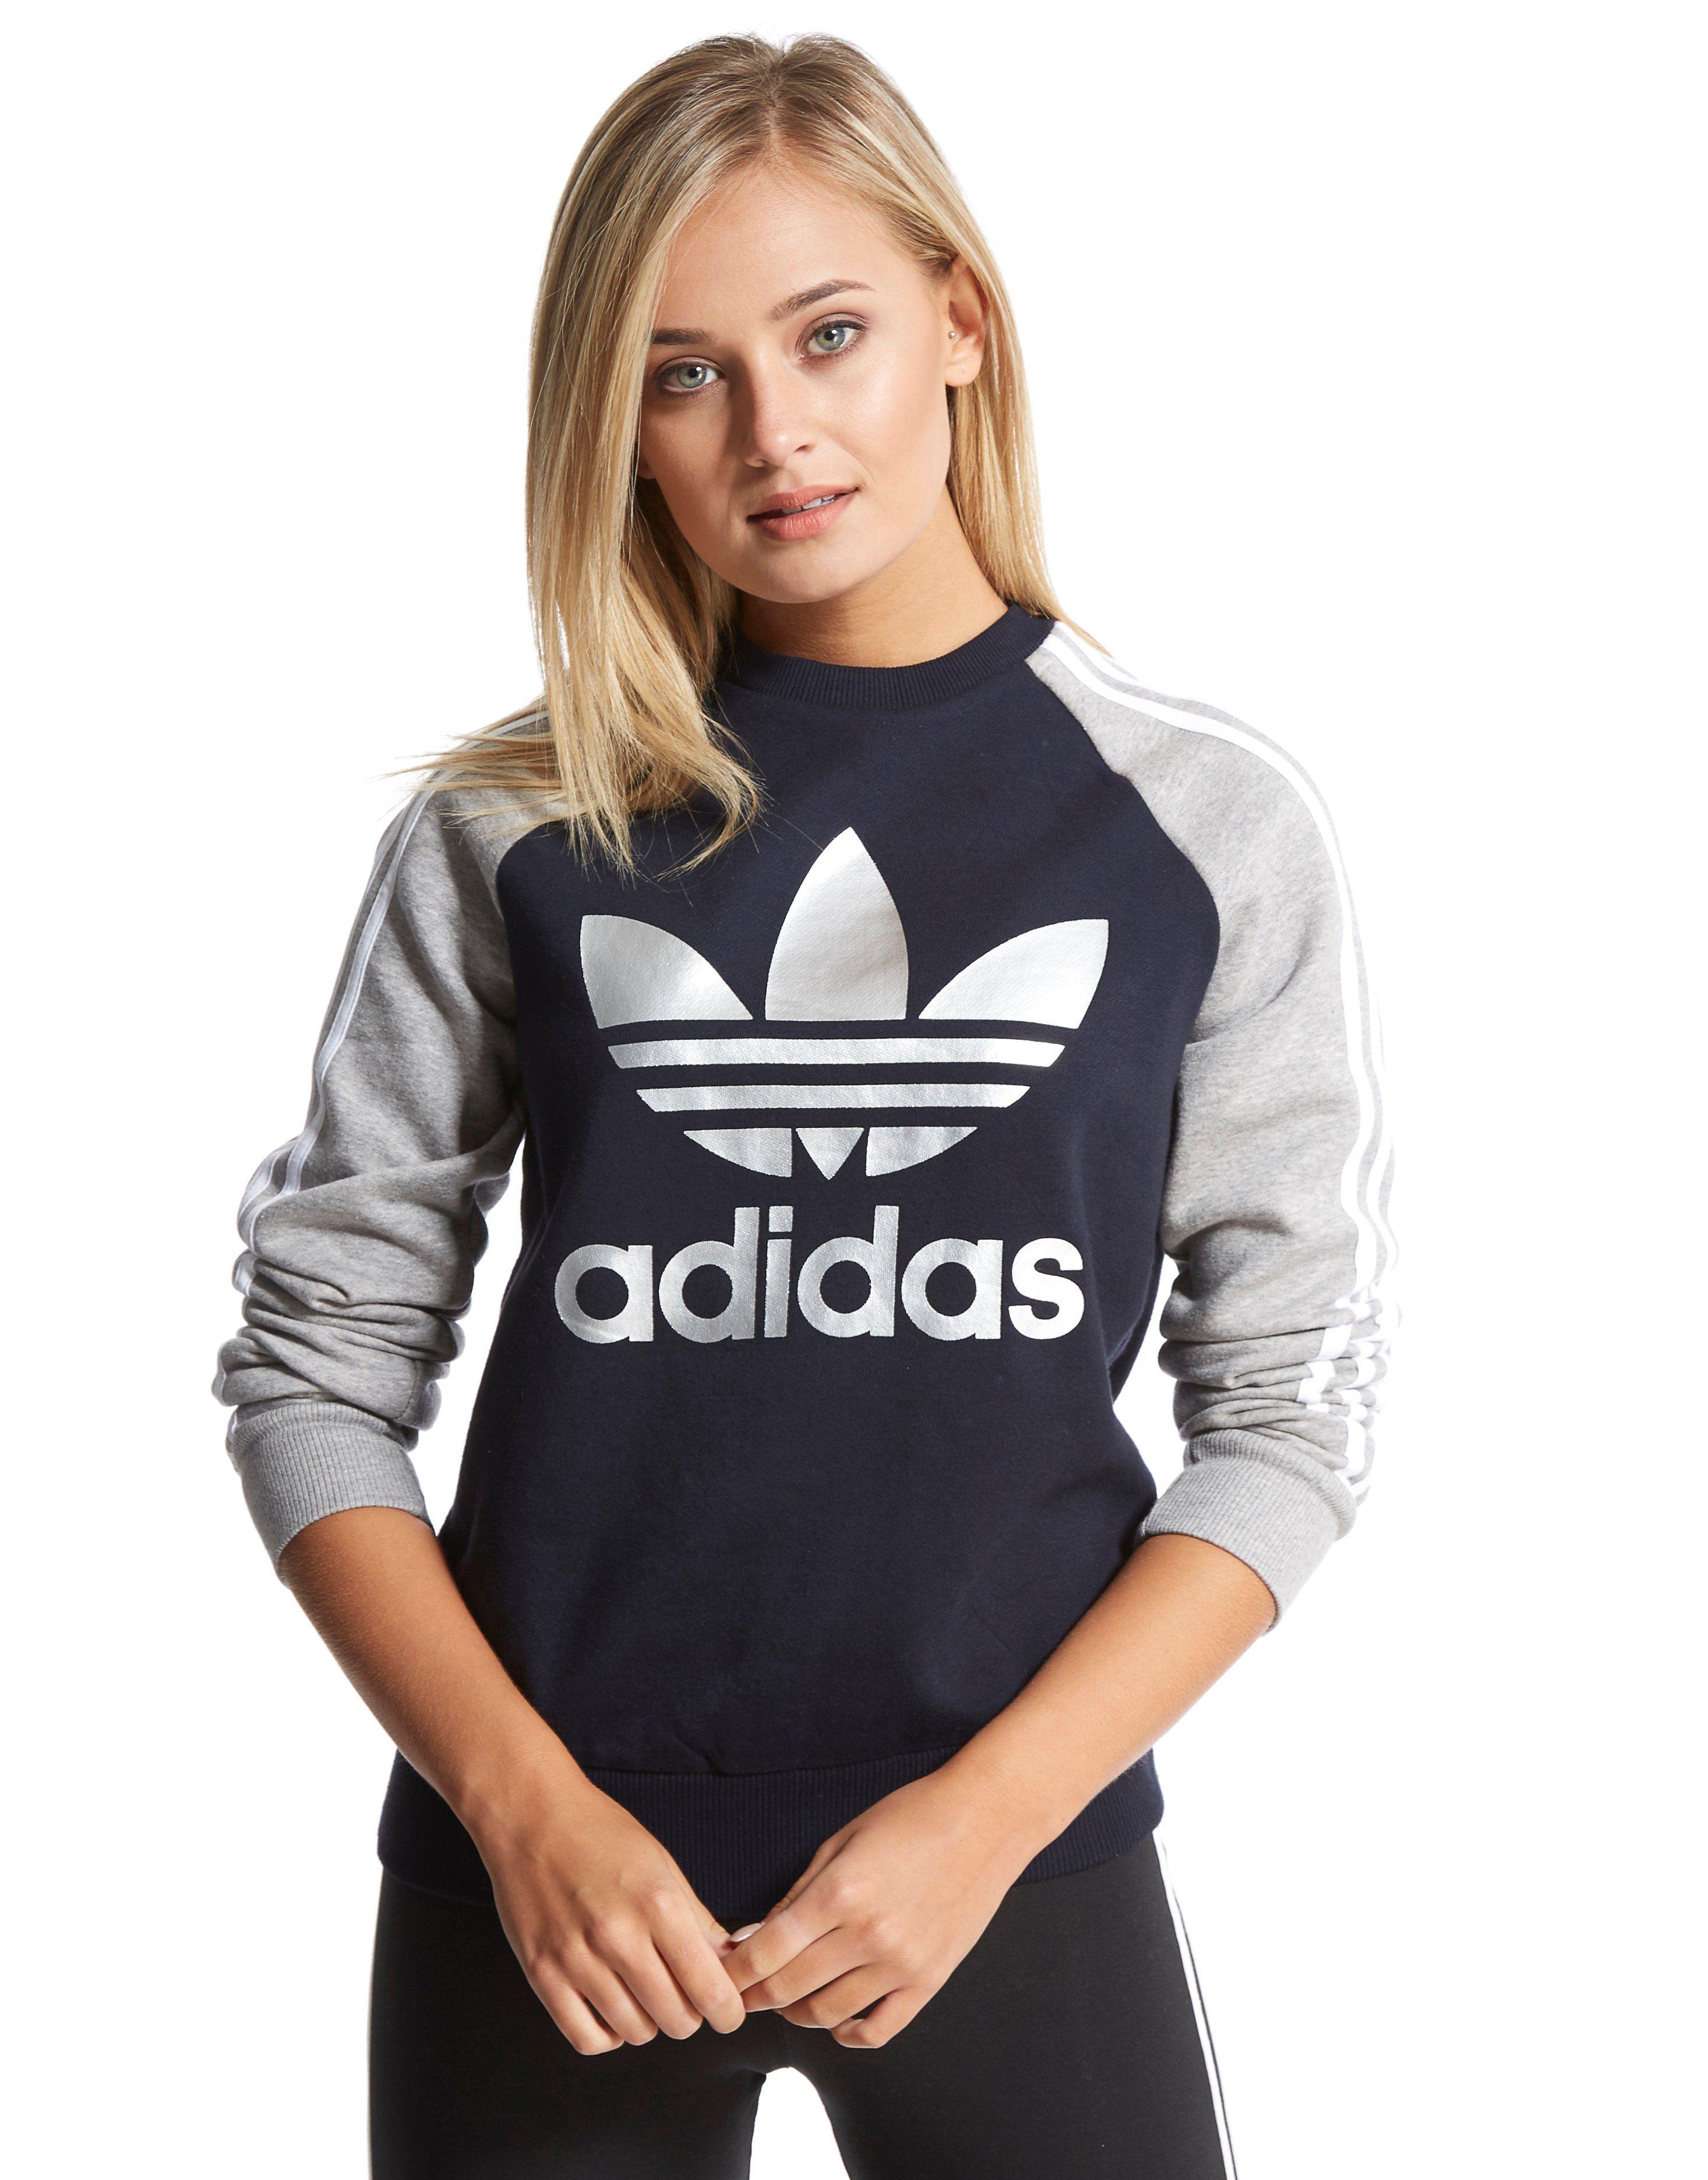 adidas Originals 3-Stripes Crew Sweatshirt